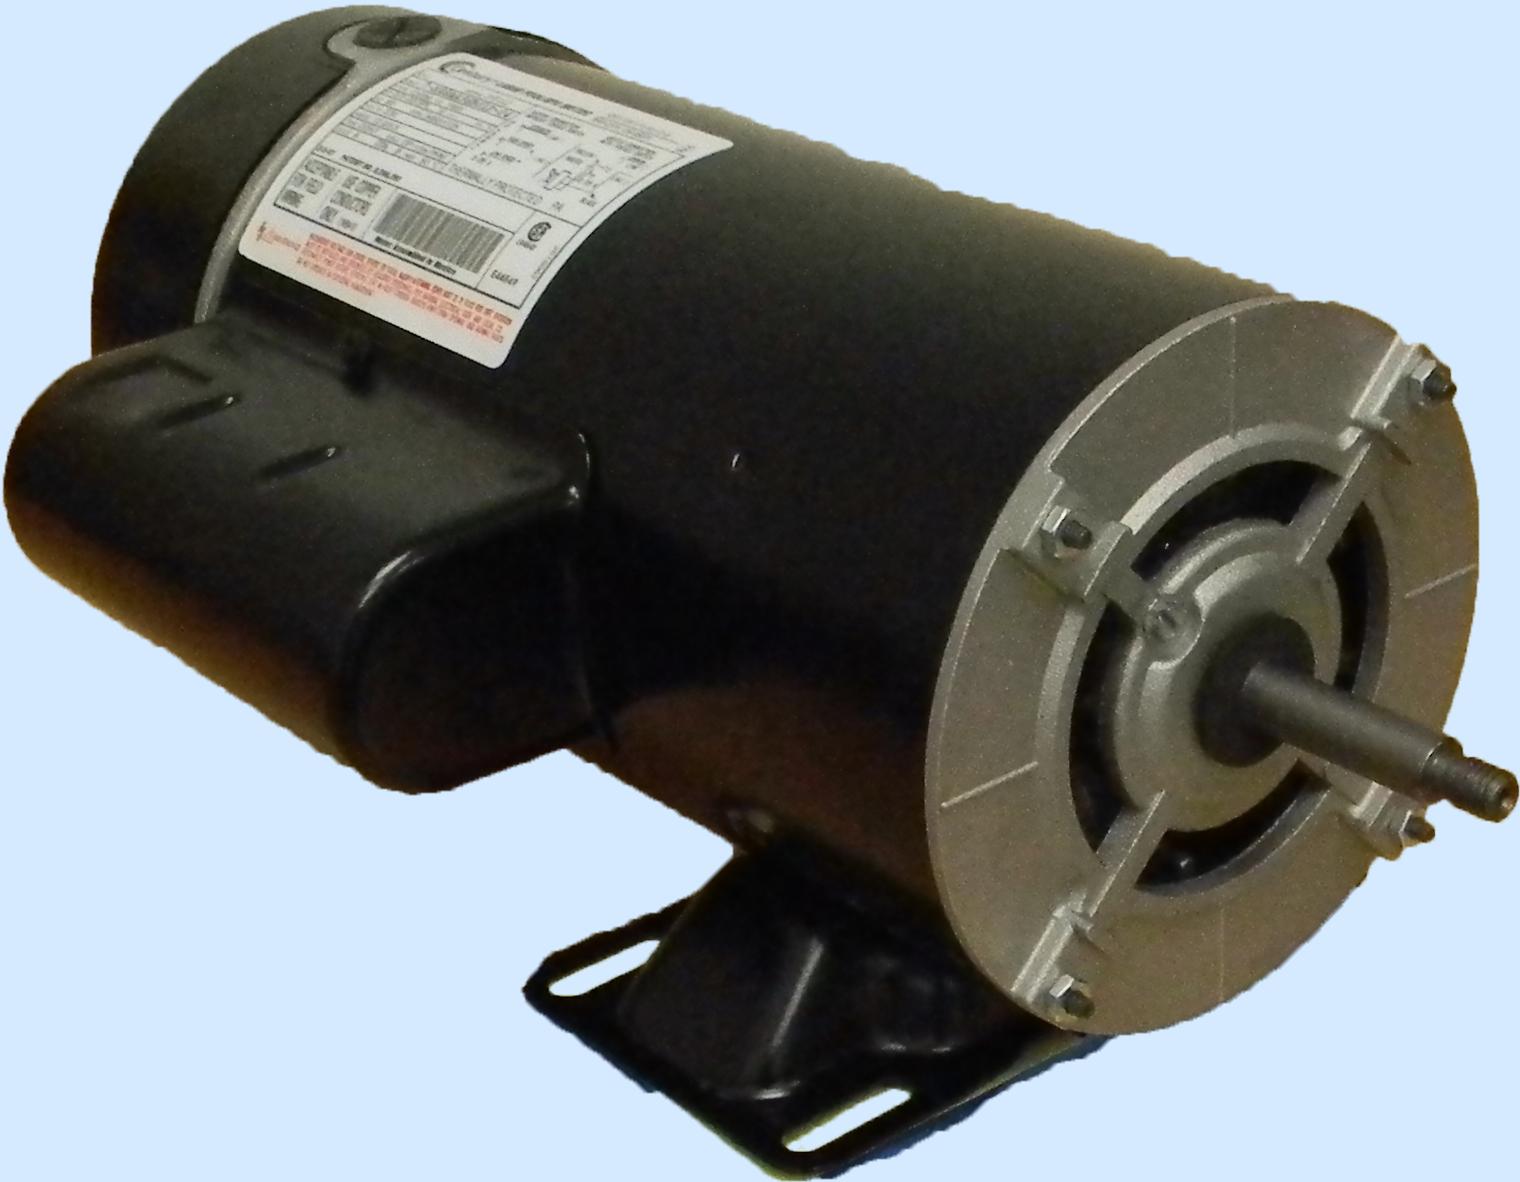 Motor Capacitor Wiring Diagram On Wiring Diagram For Pool Pump Motor